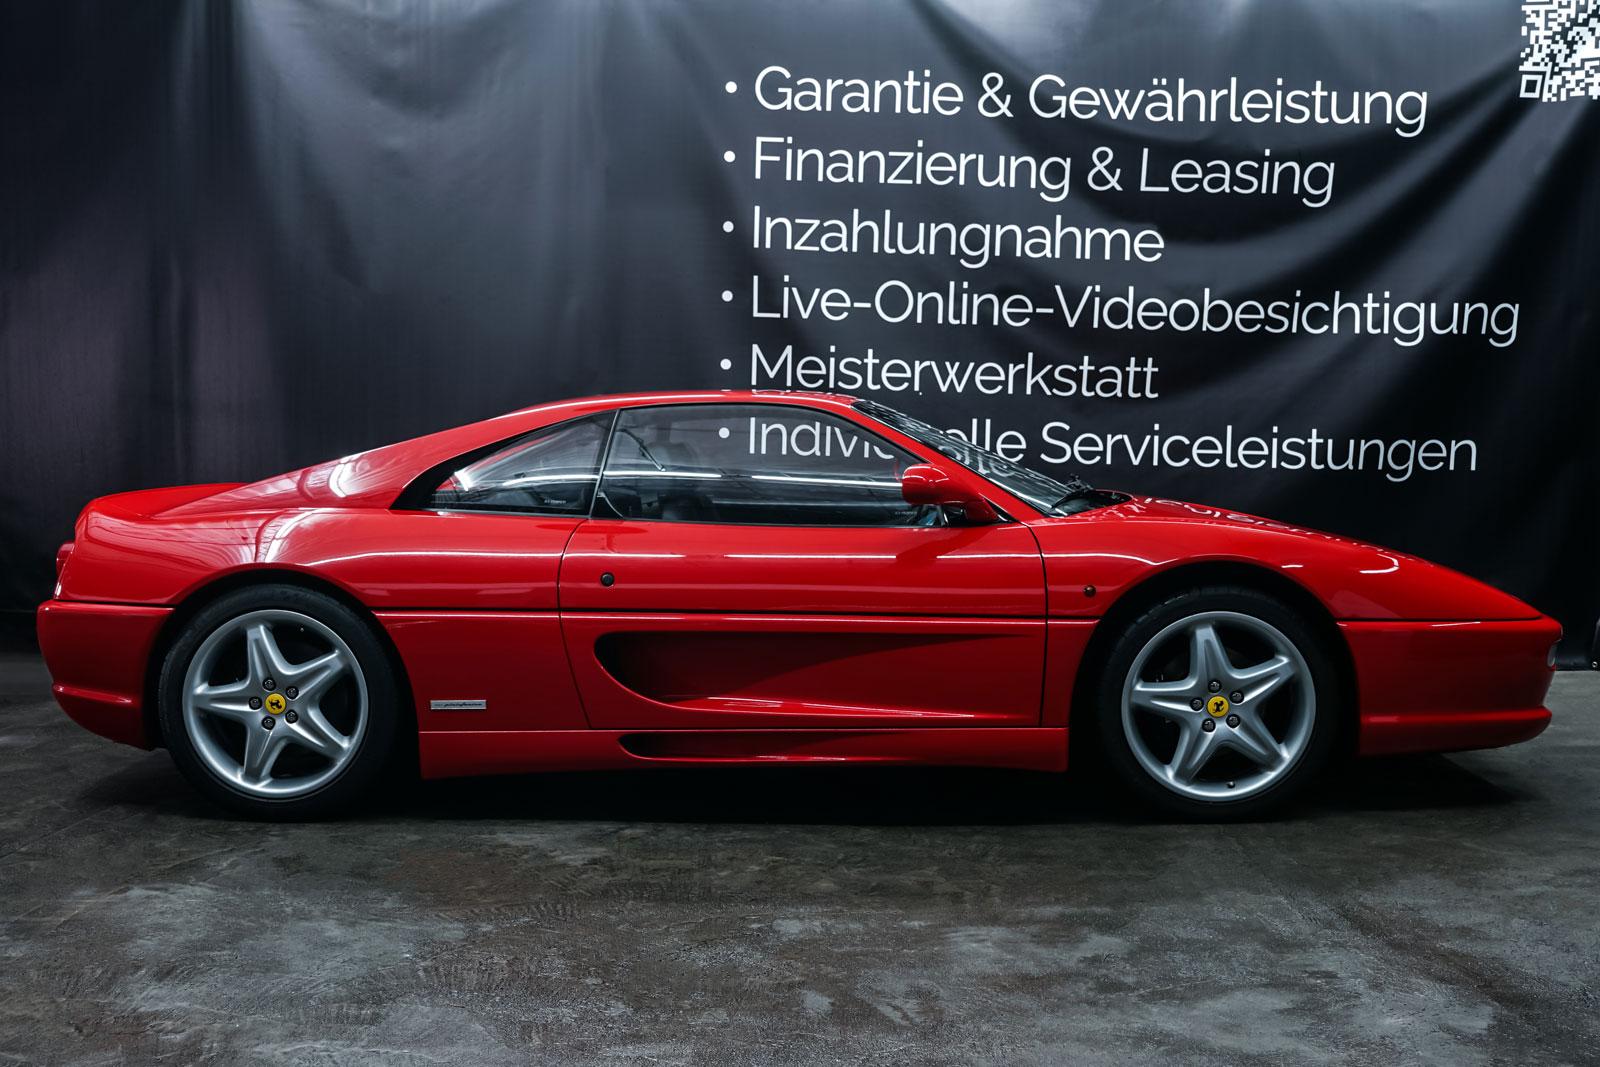 Ferrari_F355_Berlinetta_Rot_Schwarz_FER-7159_16_w